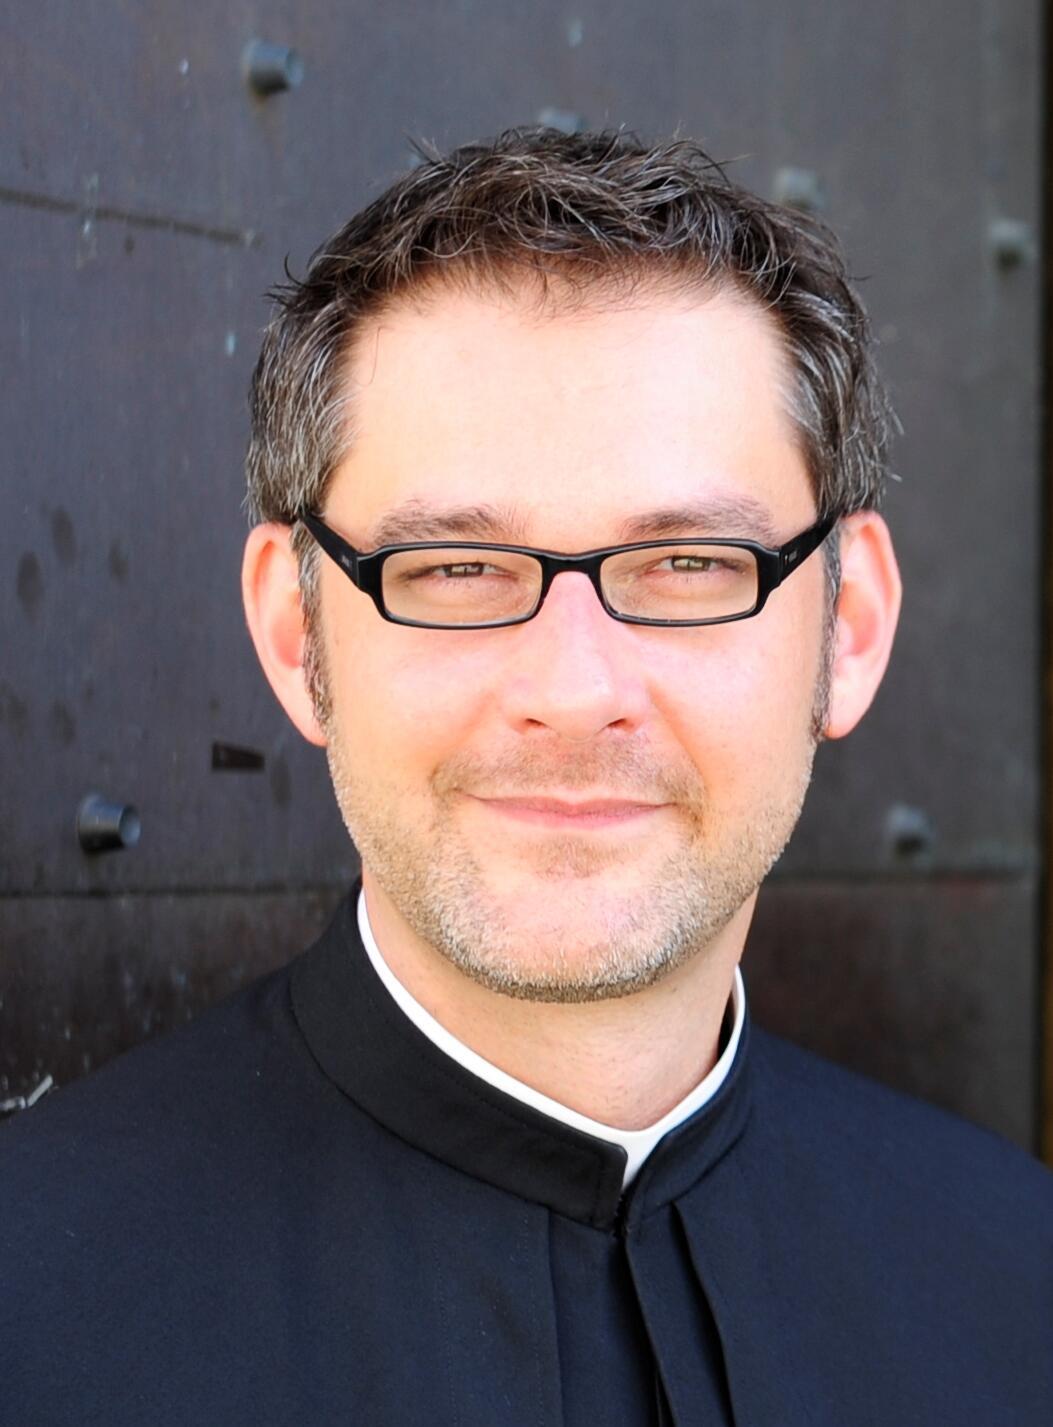 Pater Sascha-Philipp Geißler